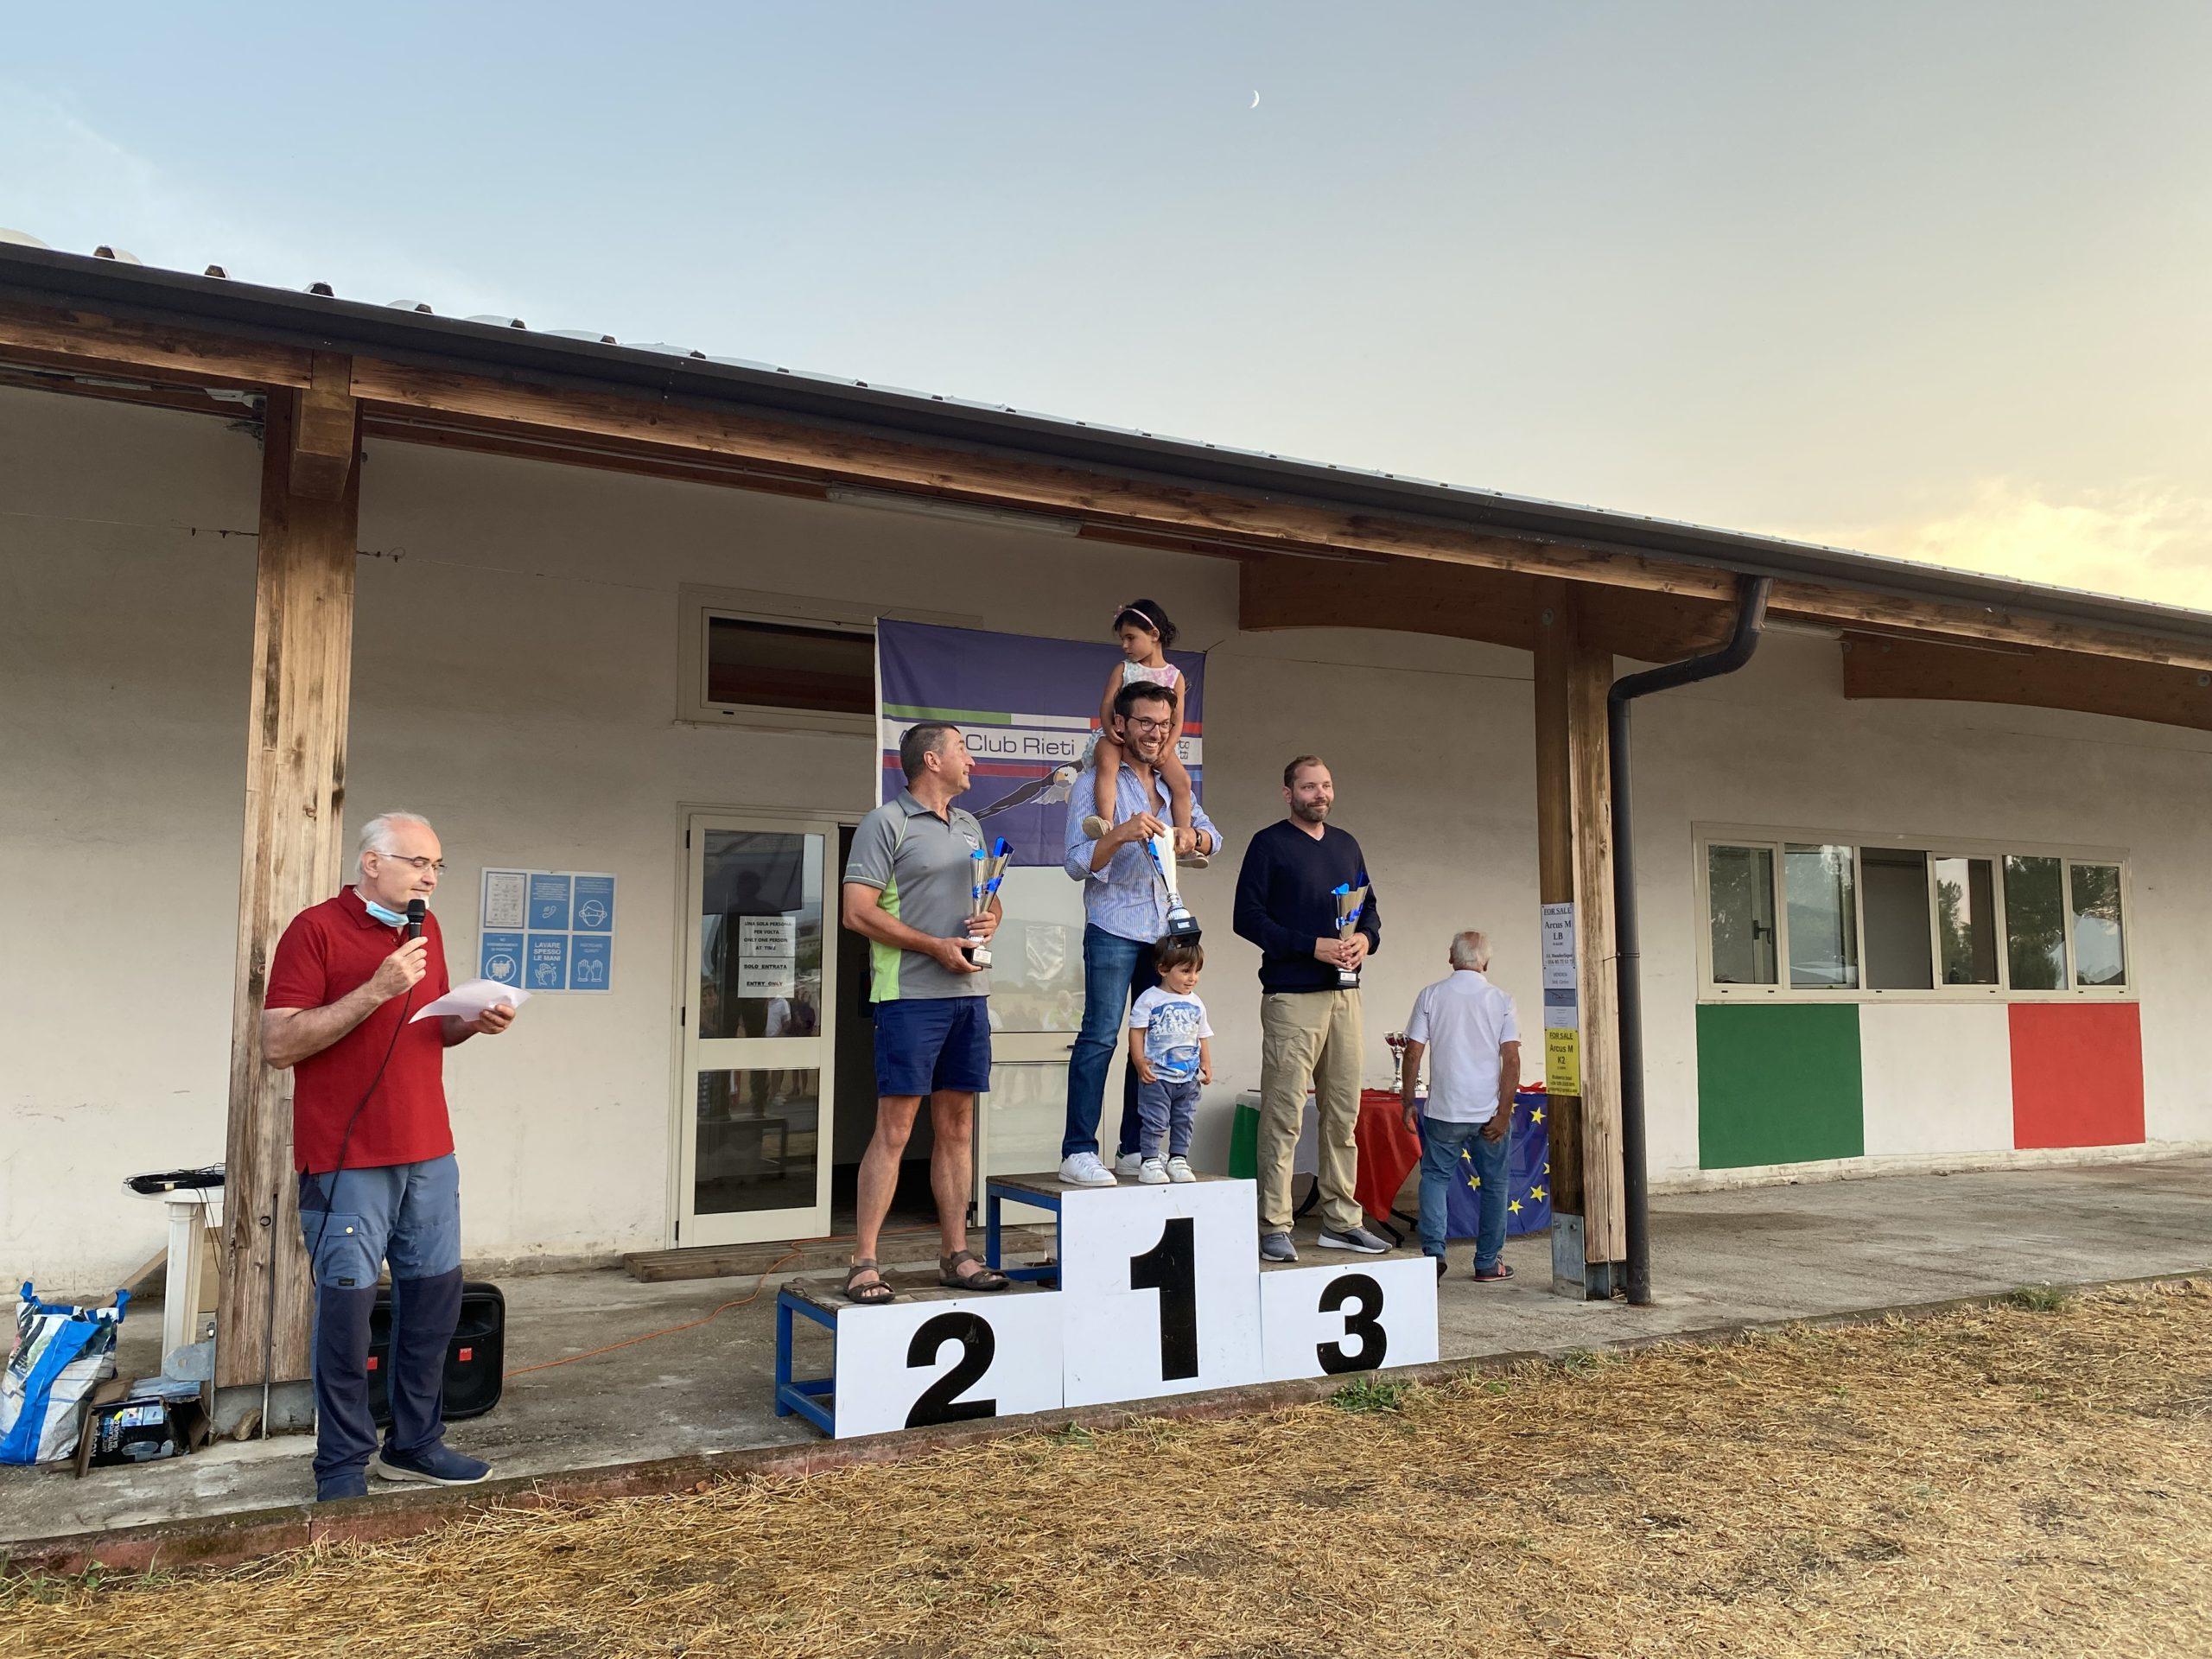 Tolle SGKA Resultate am CIM 2021 in Rieti, Italien